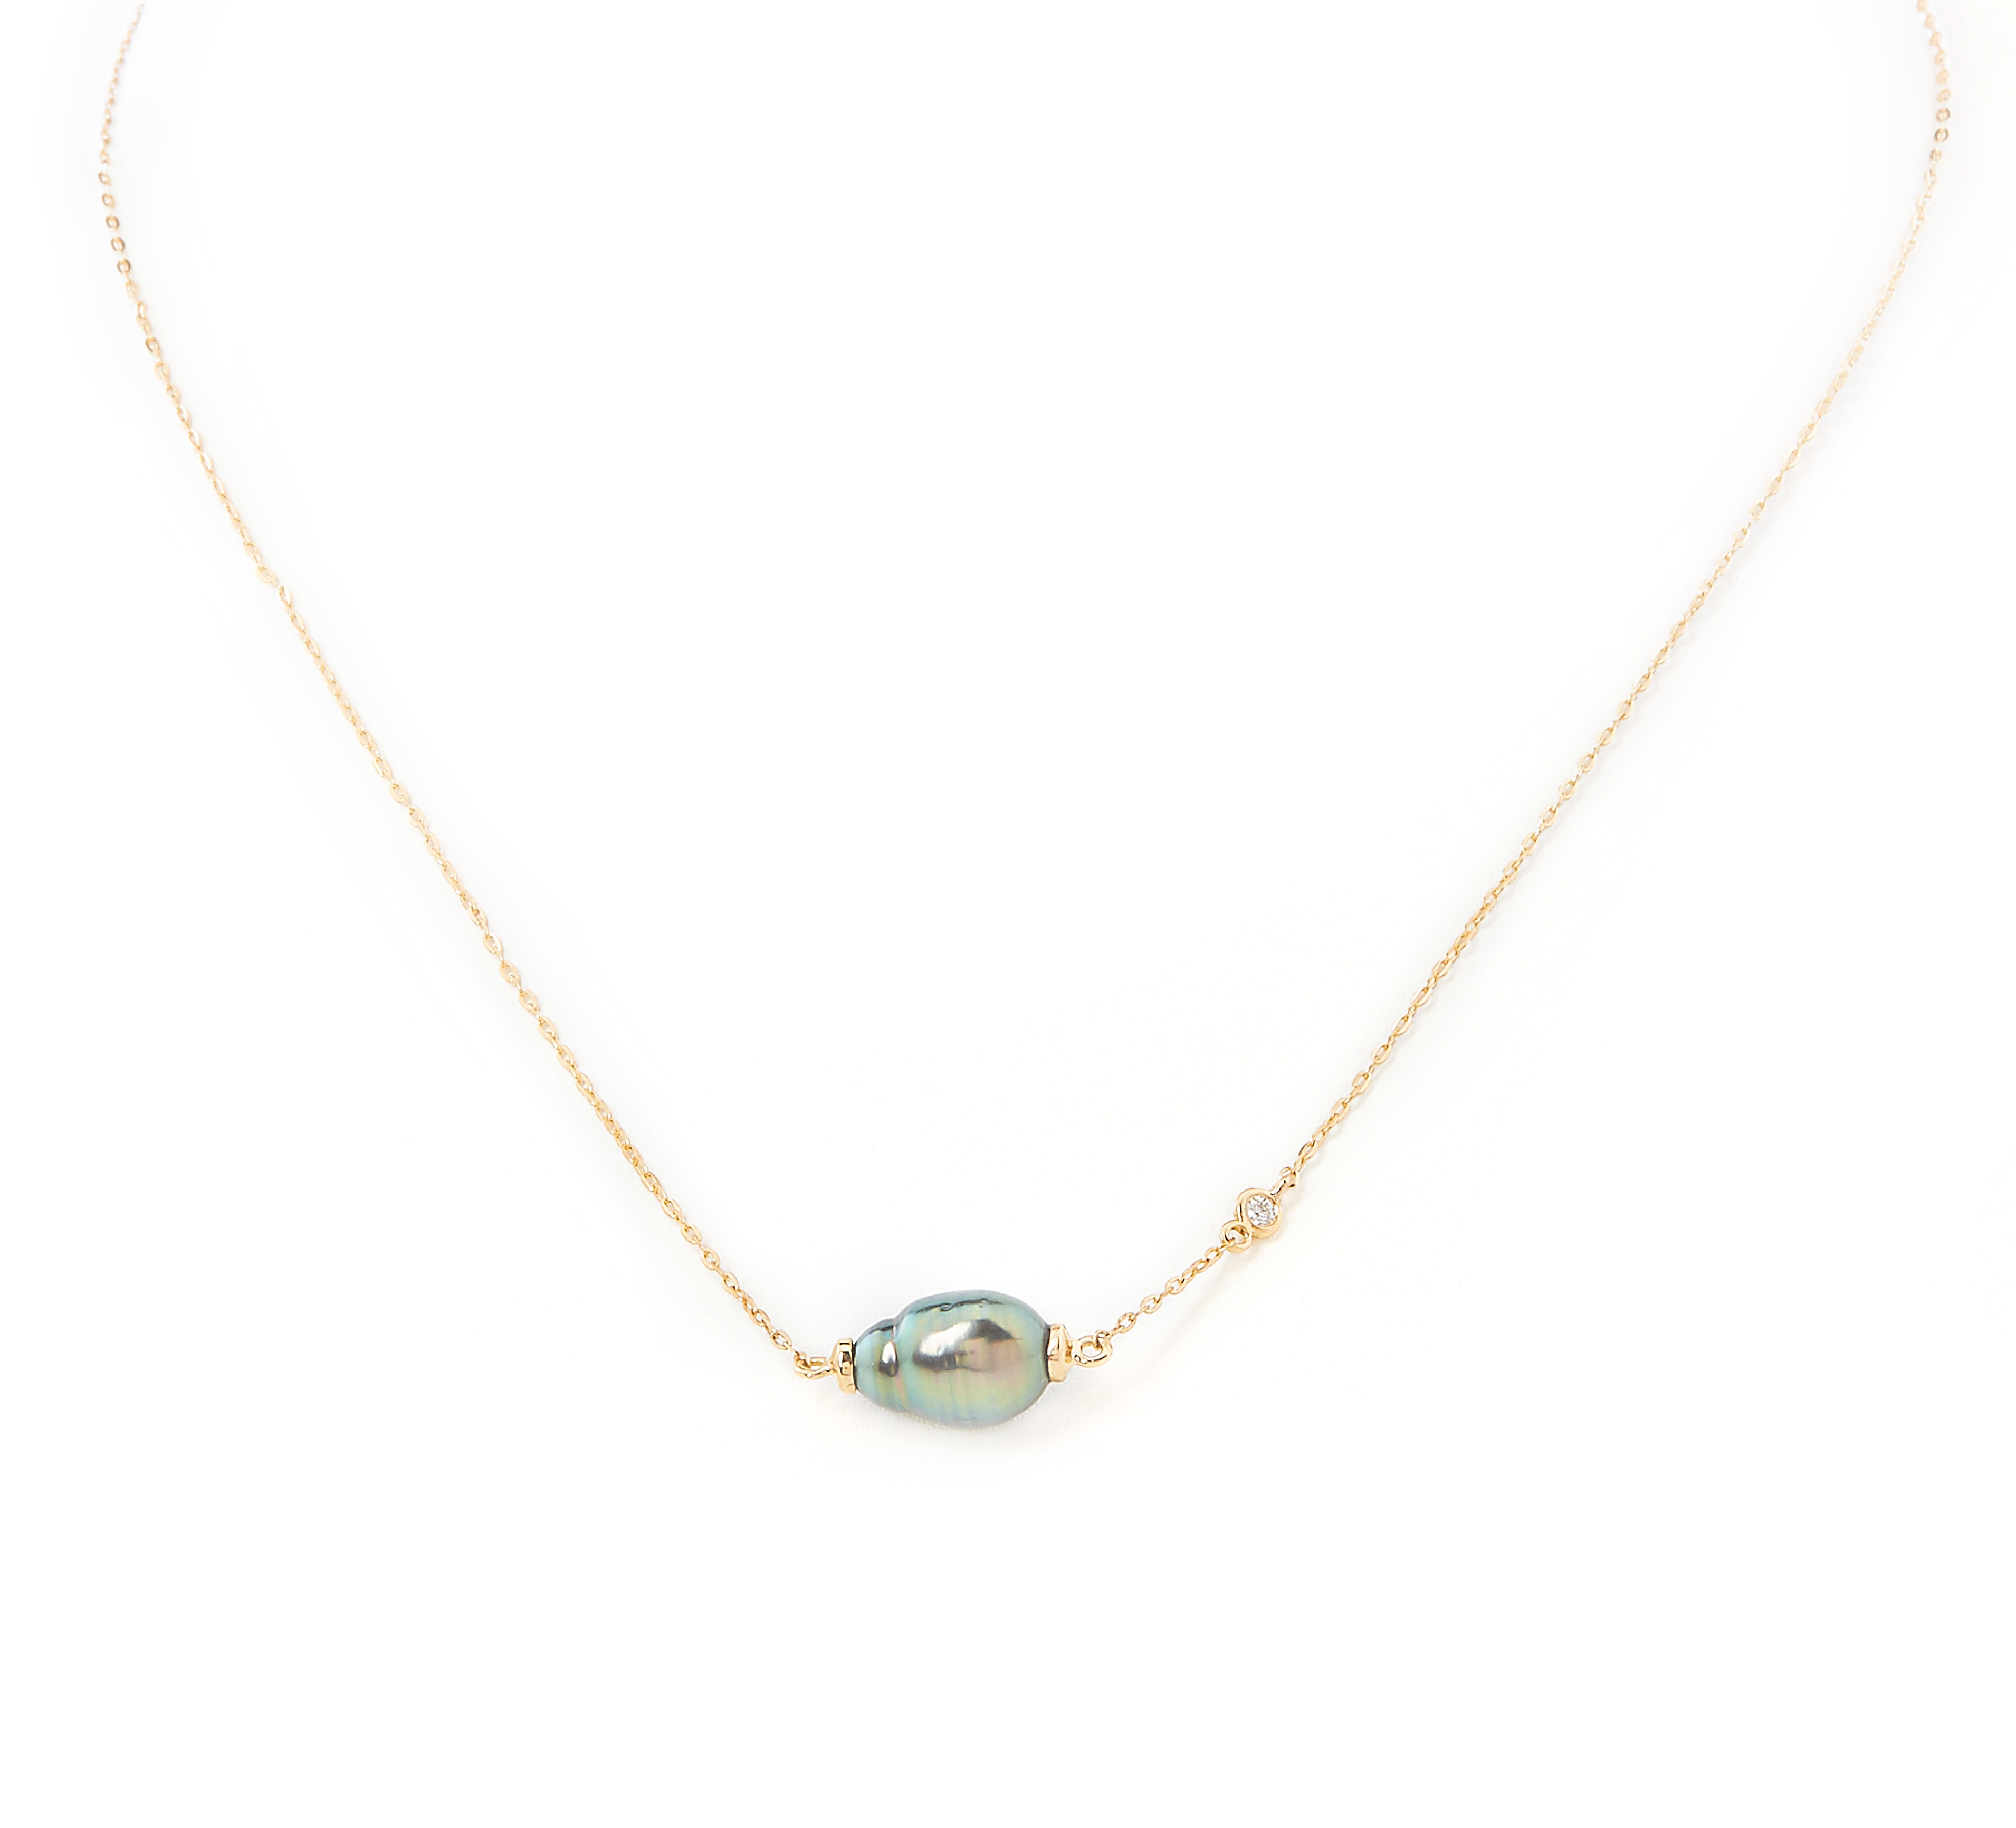 Collier ma première perle